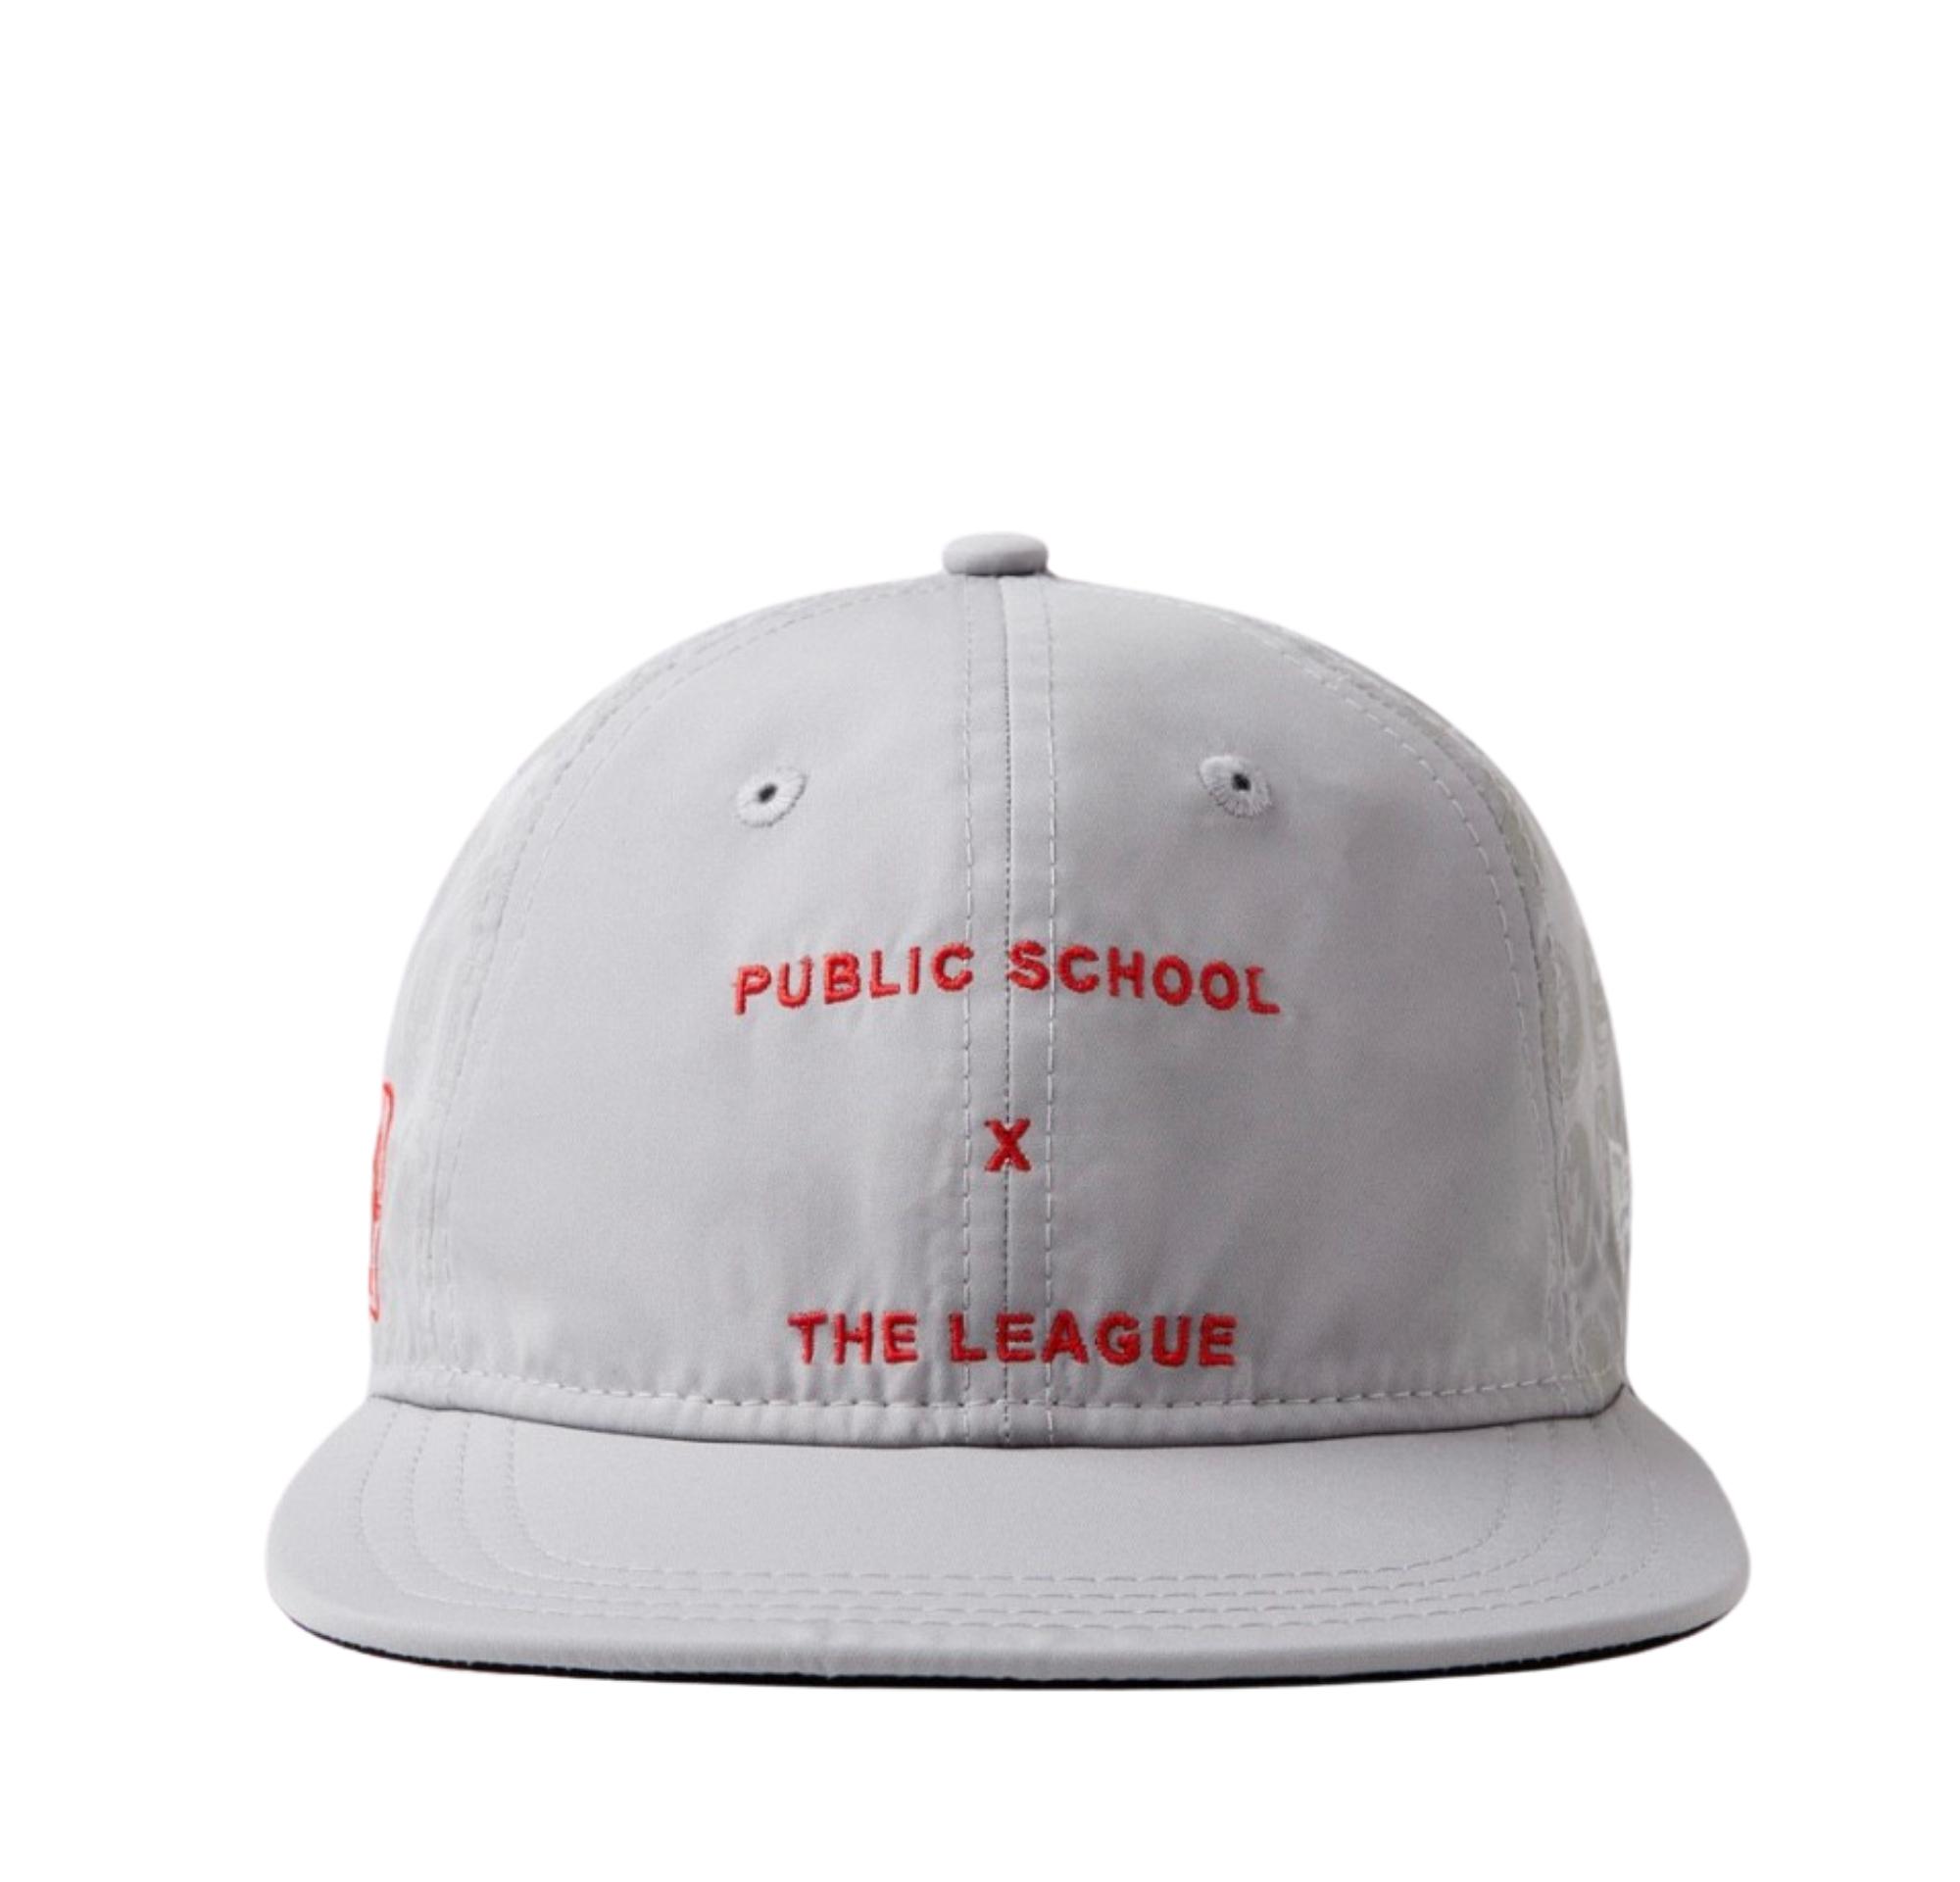 PSNYC LEAGUE HAT HOUSTON ROCKETS-1